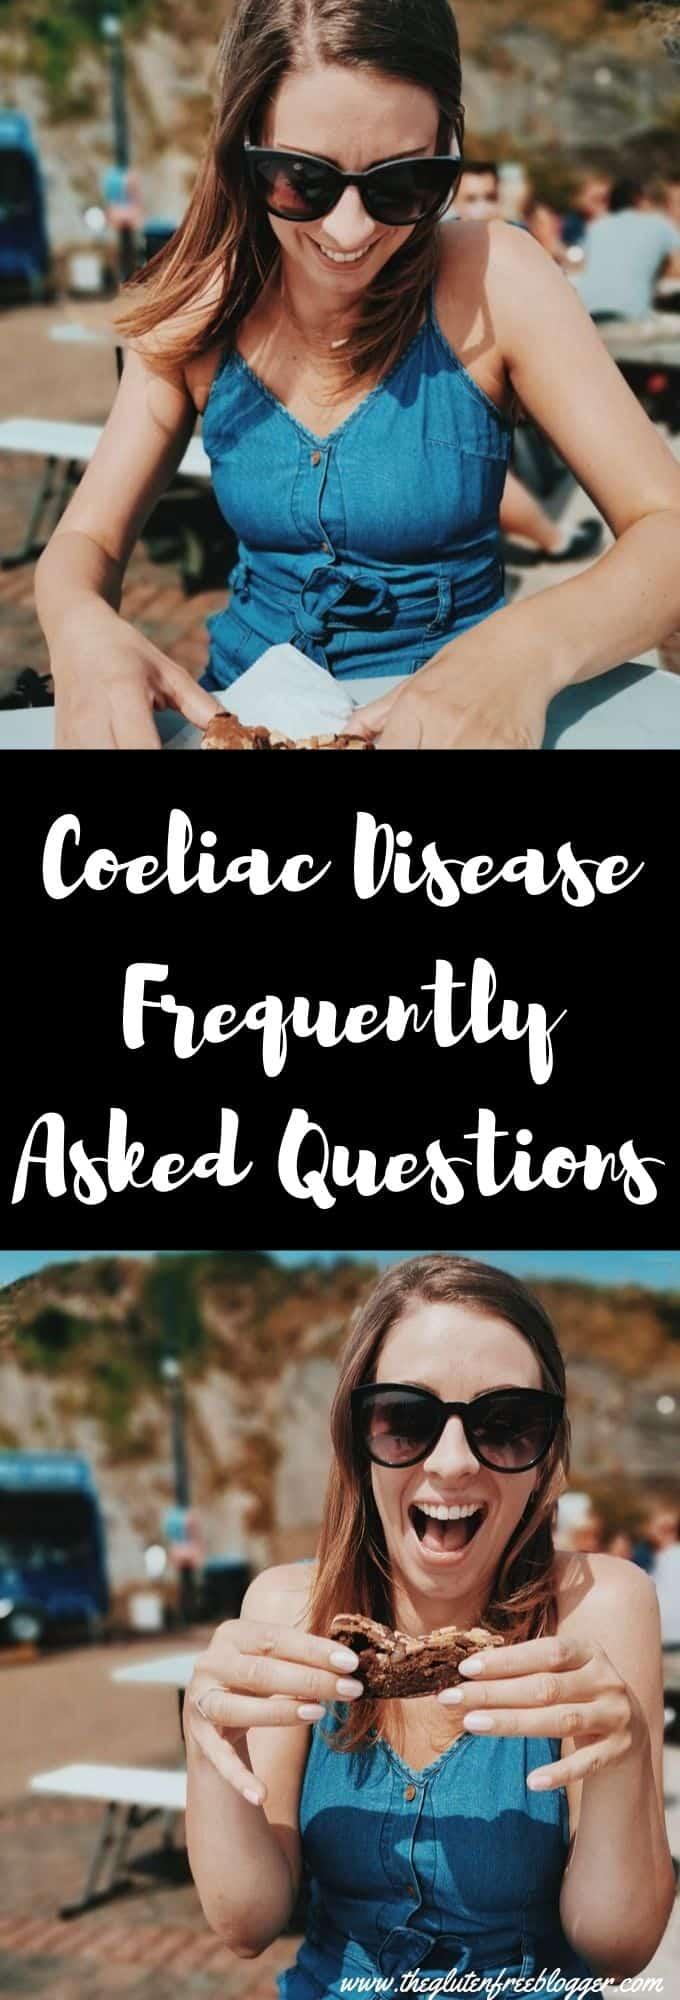 coeliac disease gluten free celiac questions FAQs